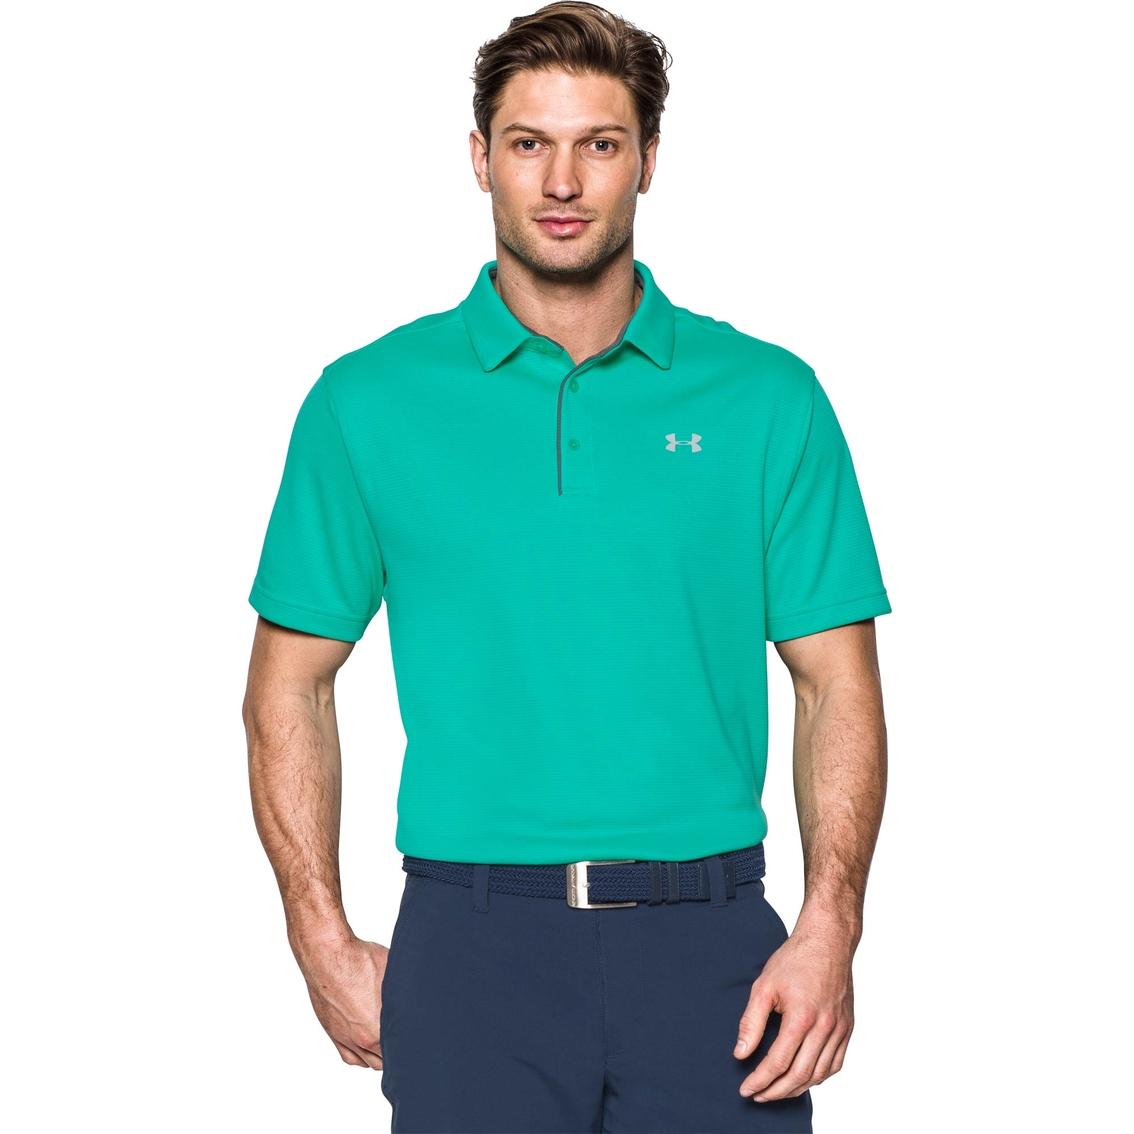 Under armour tech polo shirt men 39 s clearance shop for Under armour men s shirts clearance